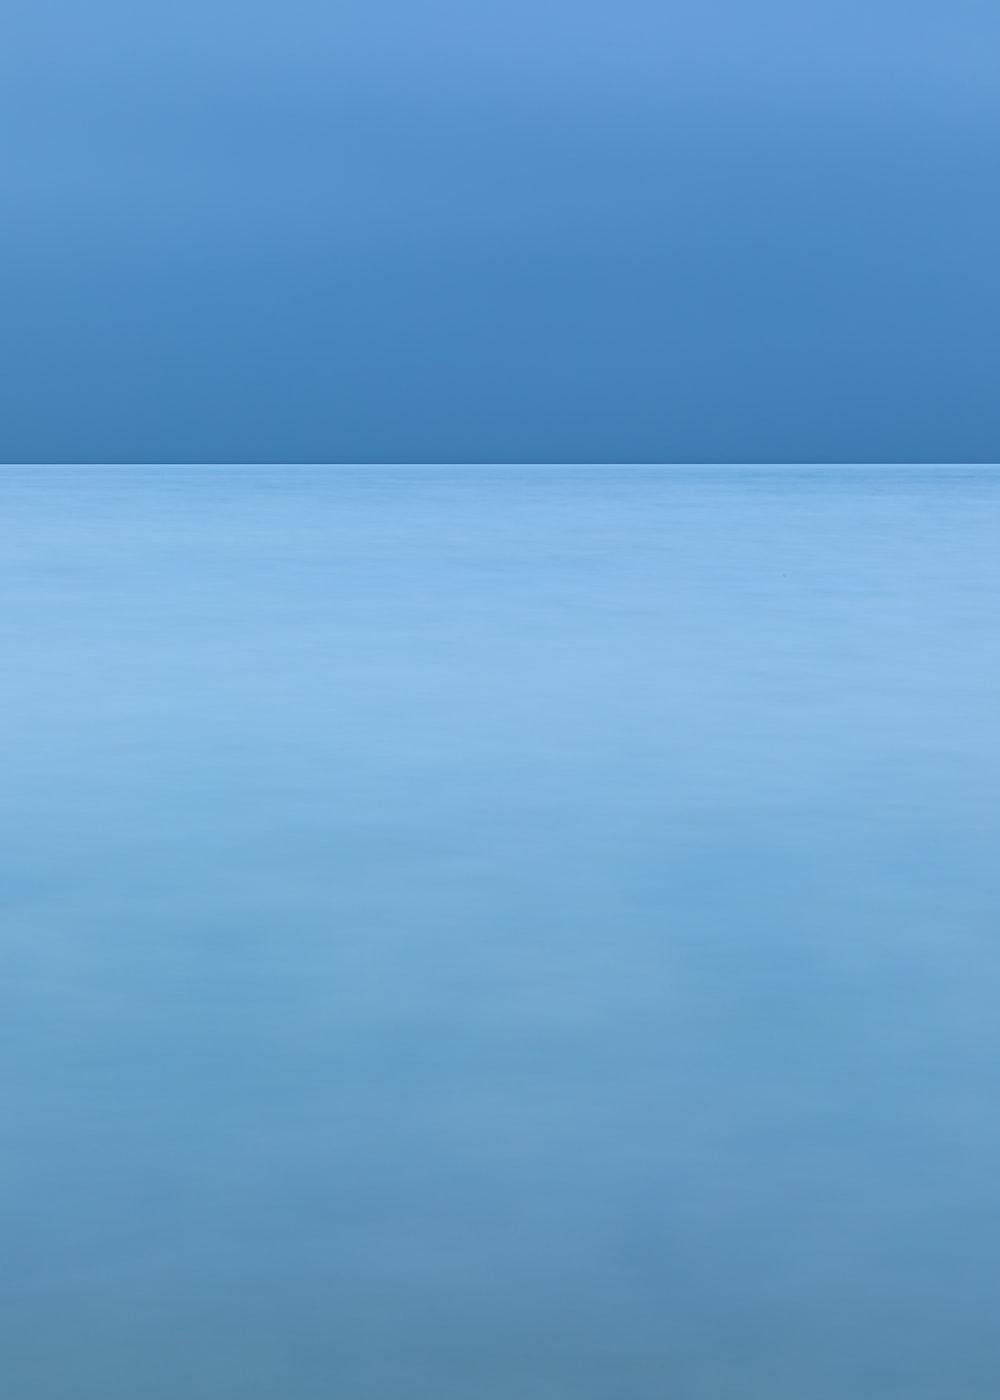 blue sky over the sea